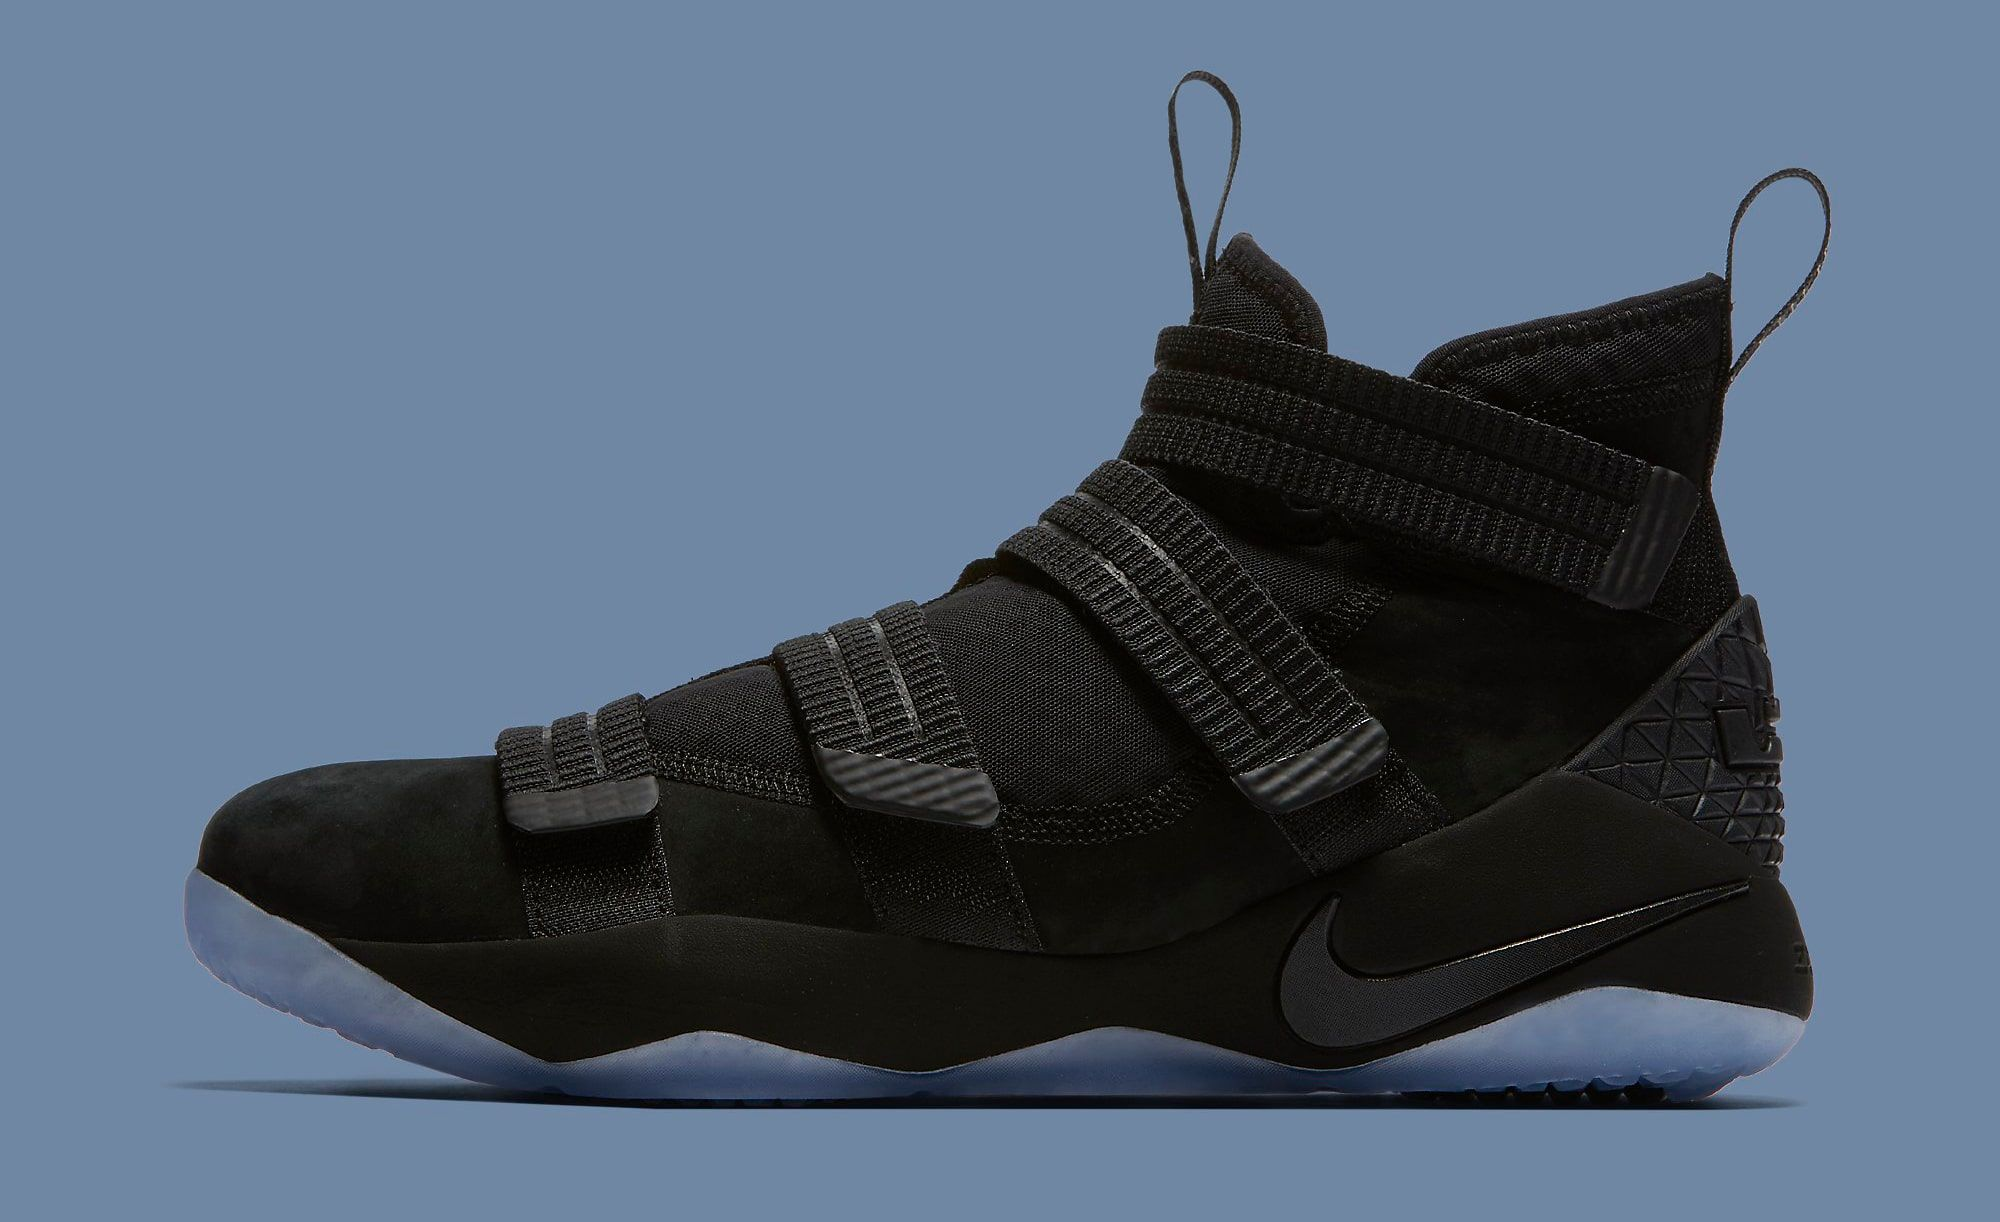 Nike LeBron XII Elite 'Rose Gold' (Black & Metallic Red Bronze)   Athletic  Footwear Mostly Nike   Pinterest   Nike lebron